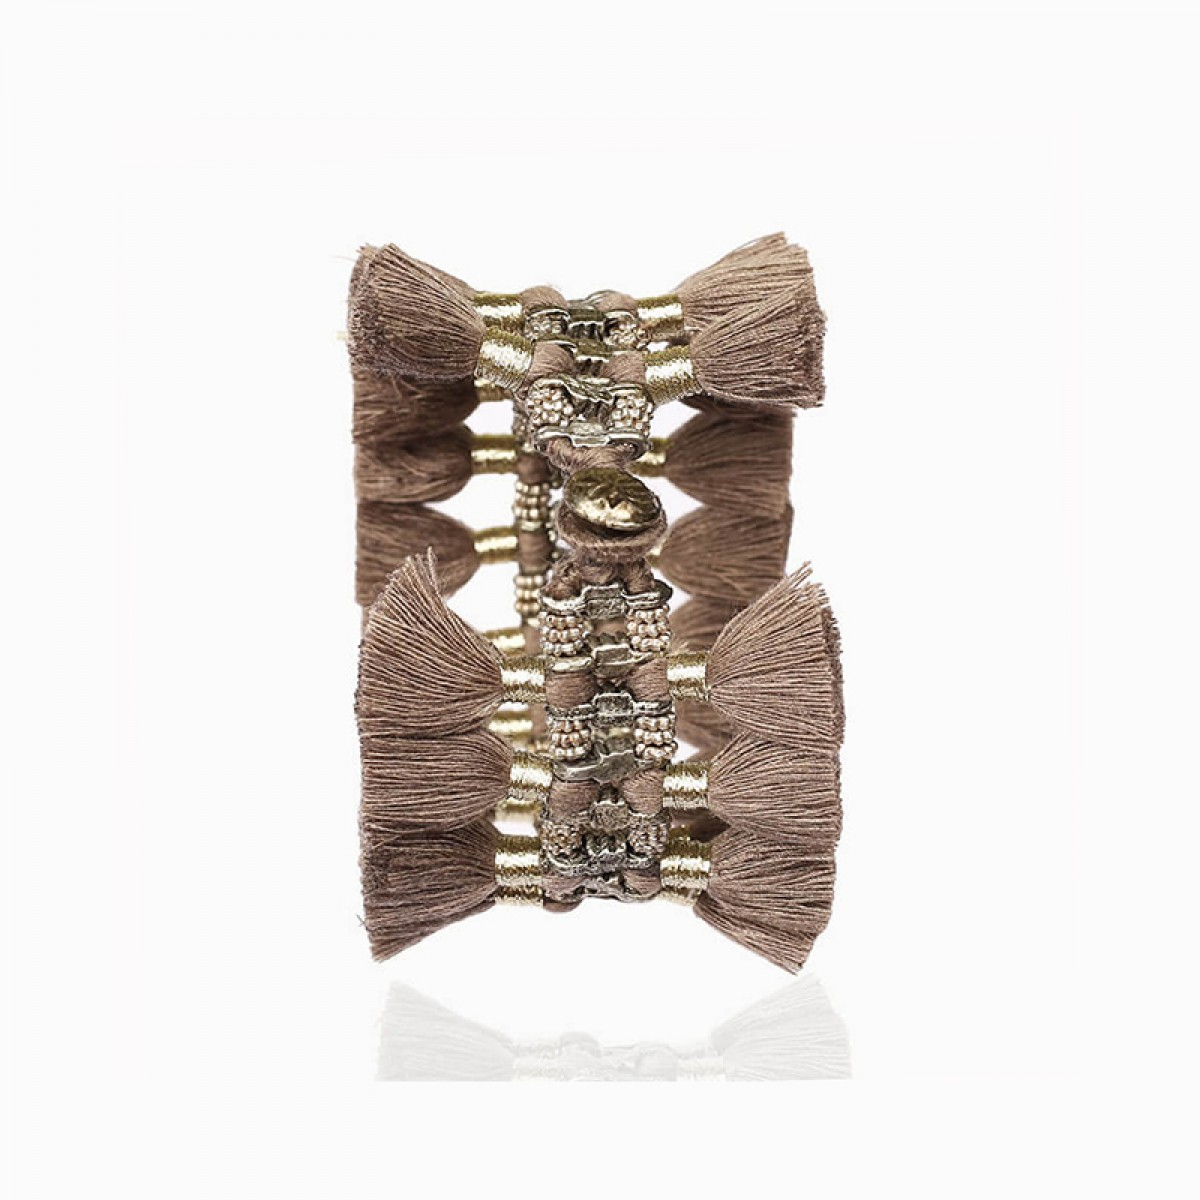 Bohemian Fashion Double Tassel Bracelet - Silver Grey